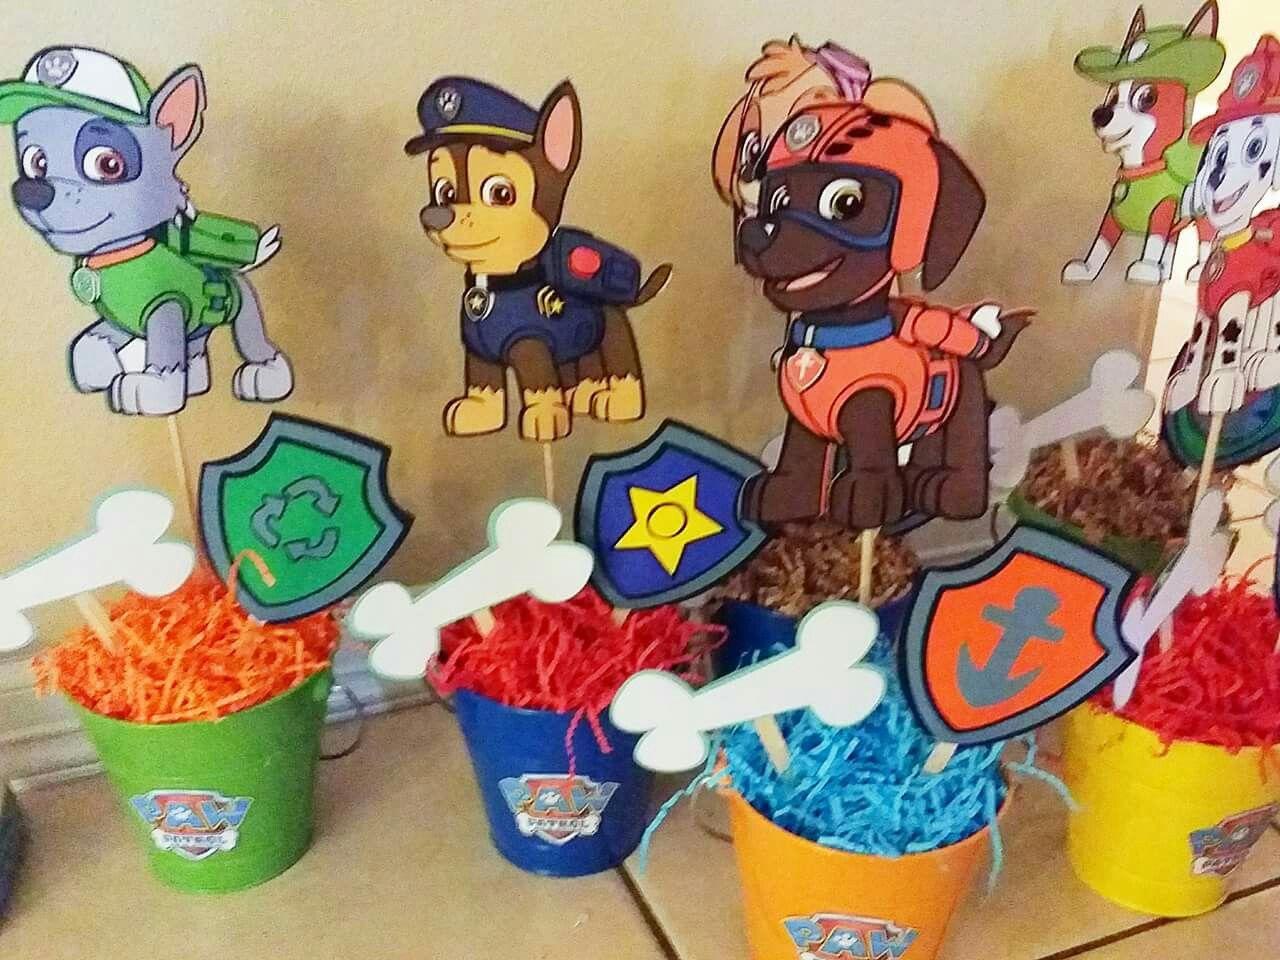 paw patrol table decorations party ideas pinterest paw patrol rh search aol co uk